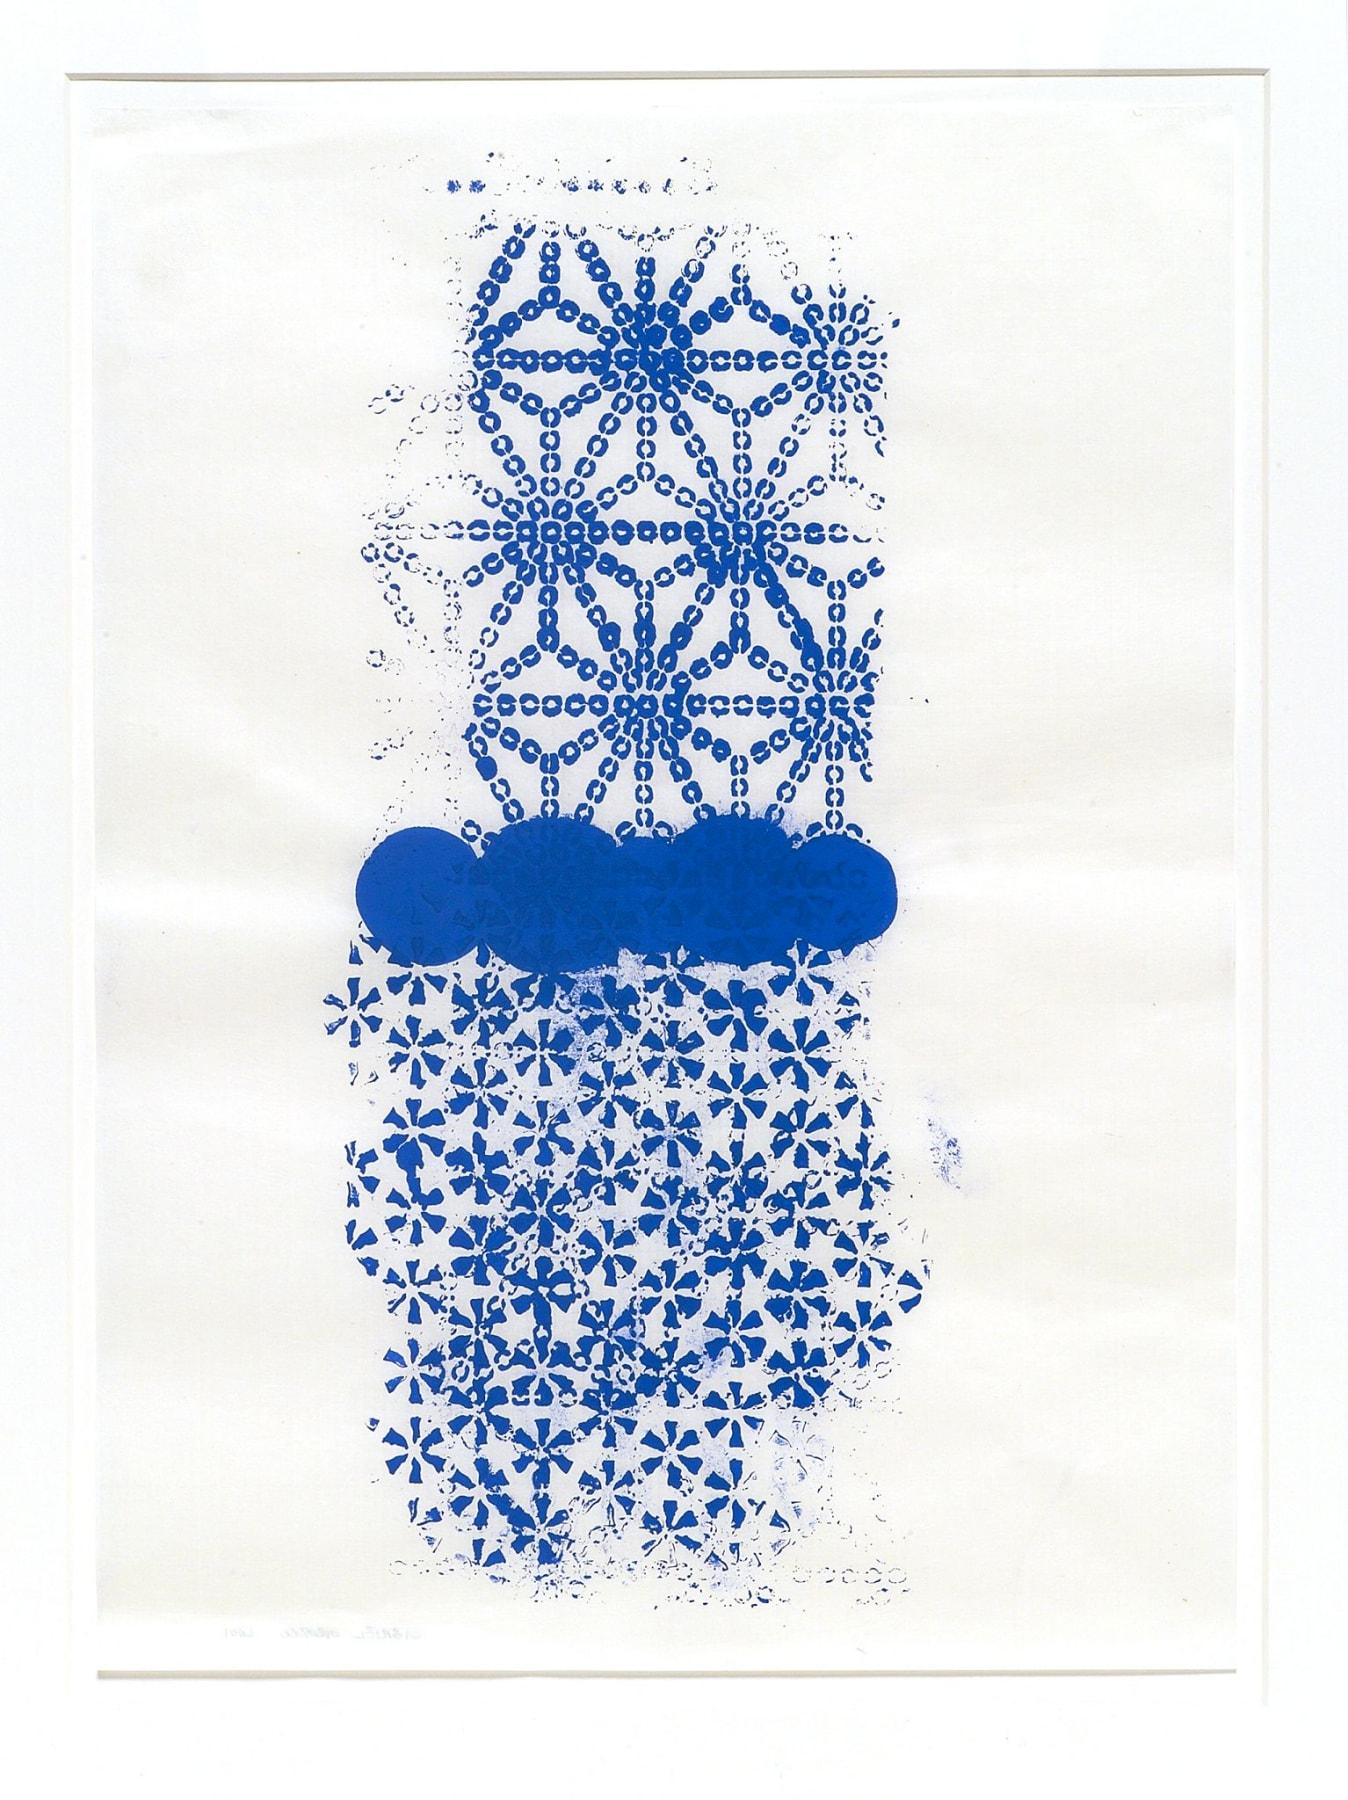 Gabriel Orozco, Katagami Prints 6, 2001